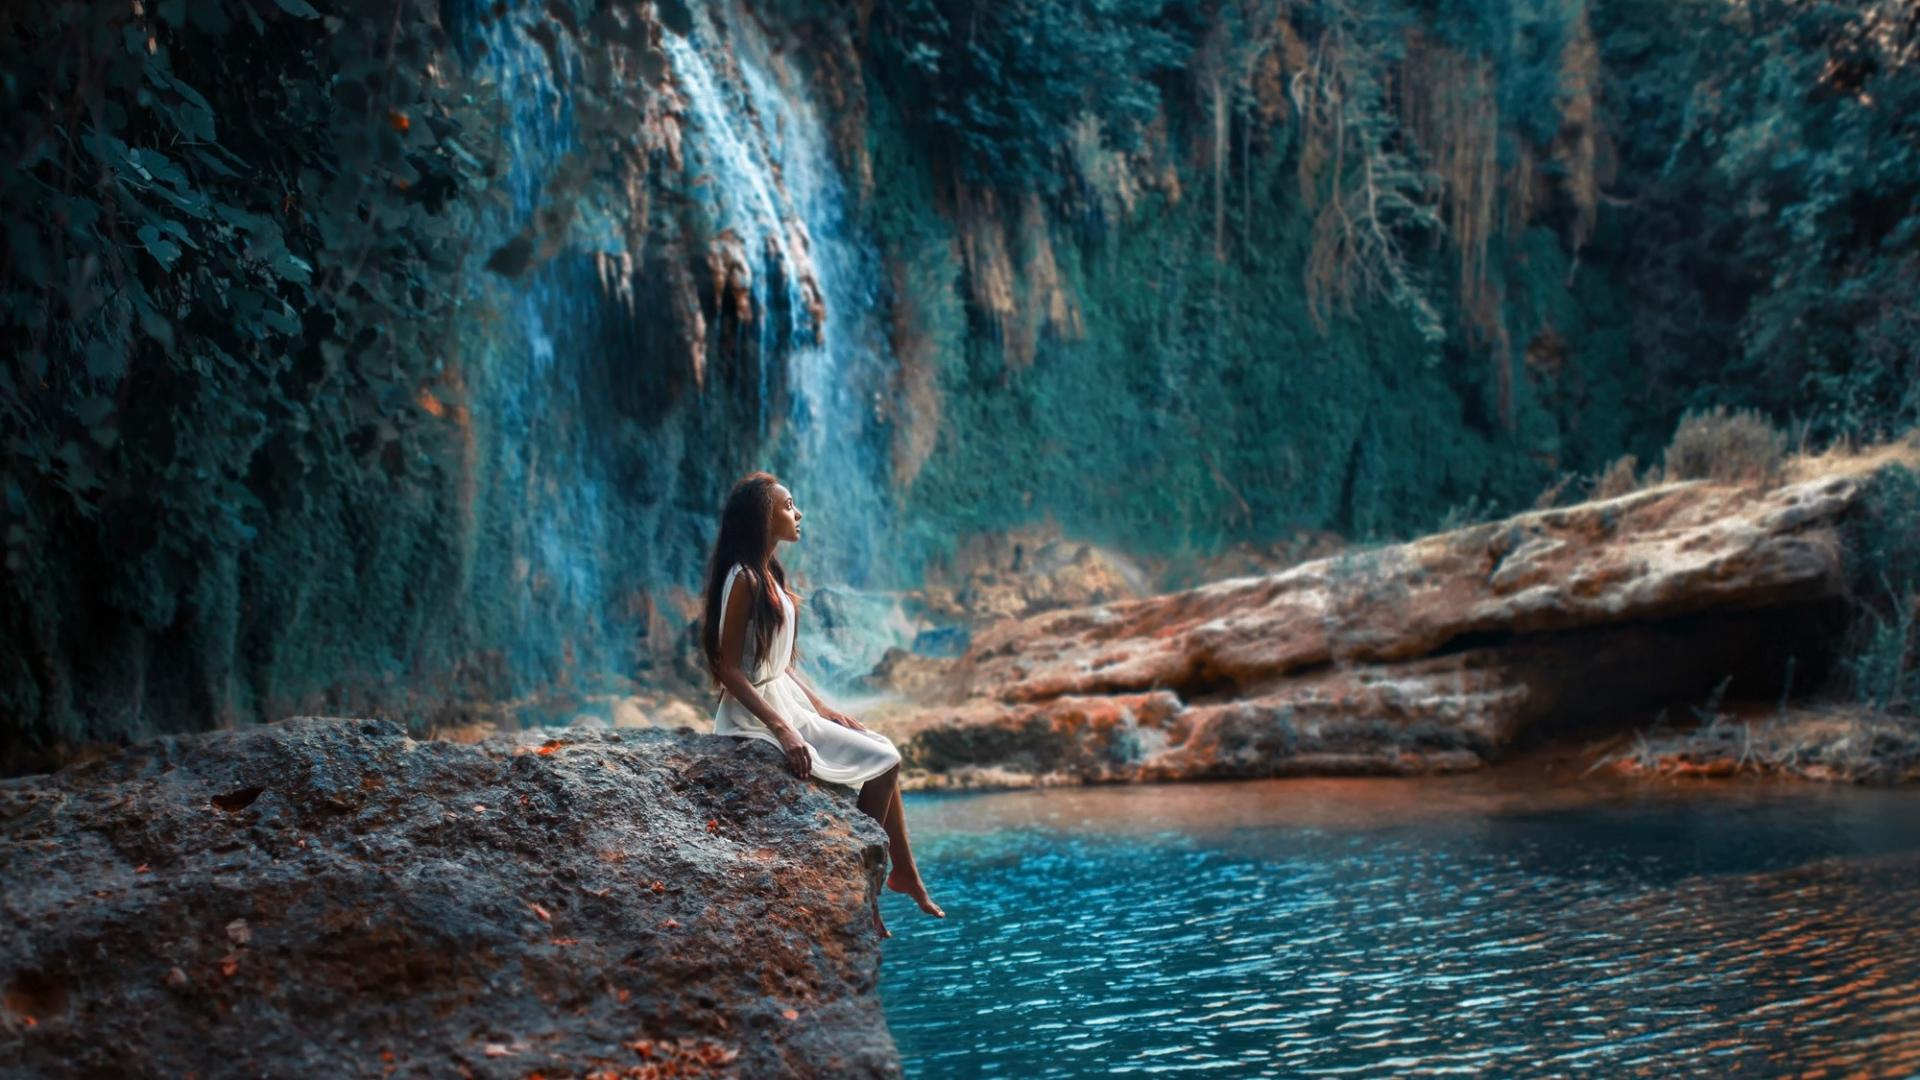 oboi-gori-vodopad-reka-les-golaya-devushka